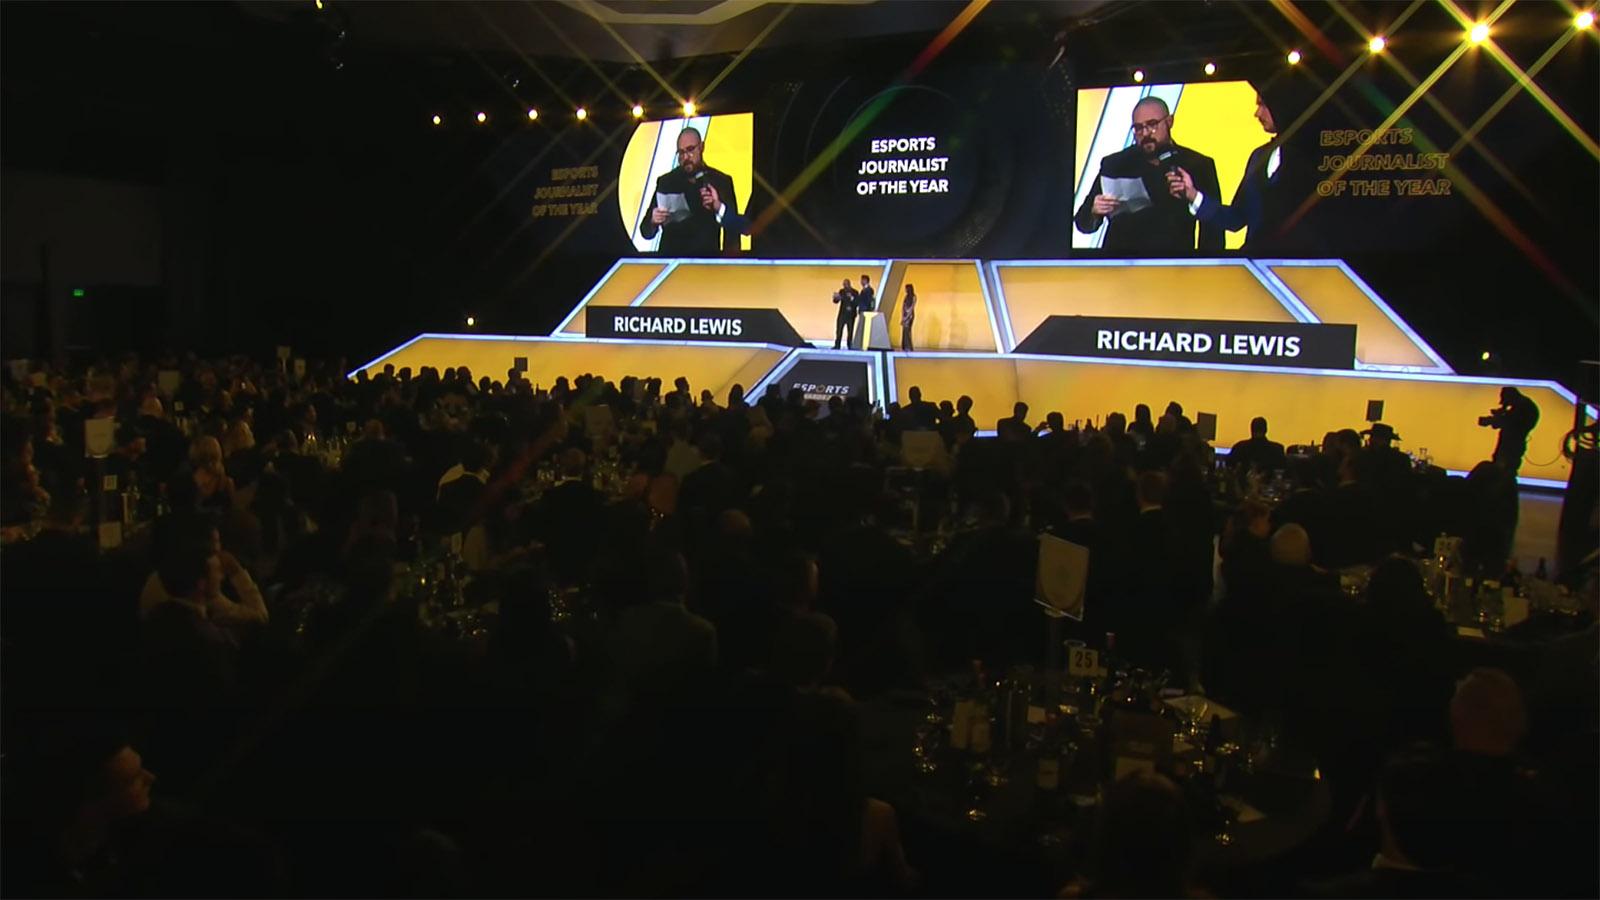 Richard Lewis Esports Awards Journalist of the year